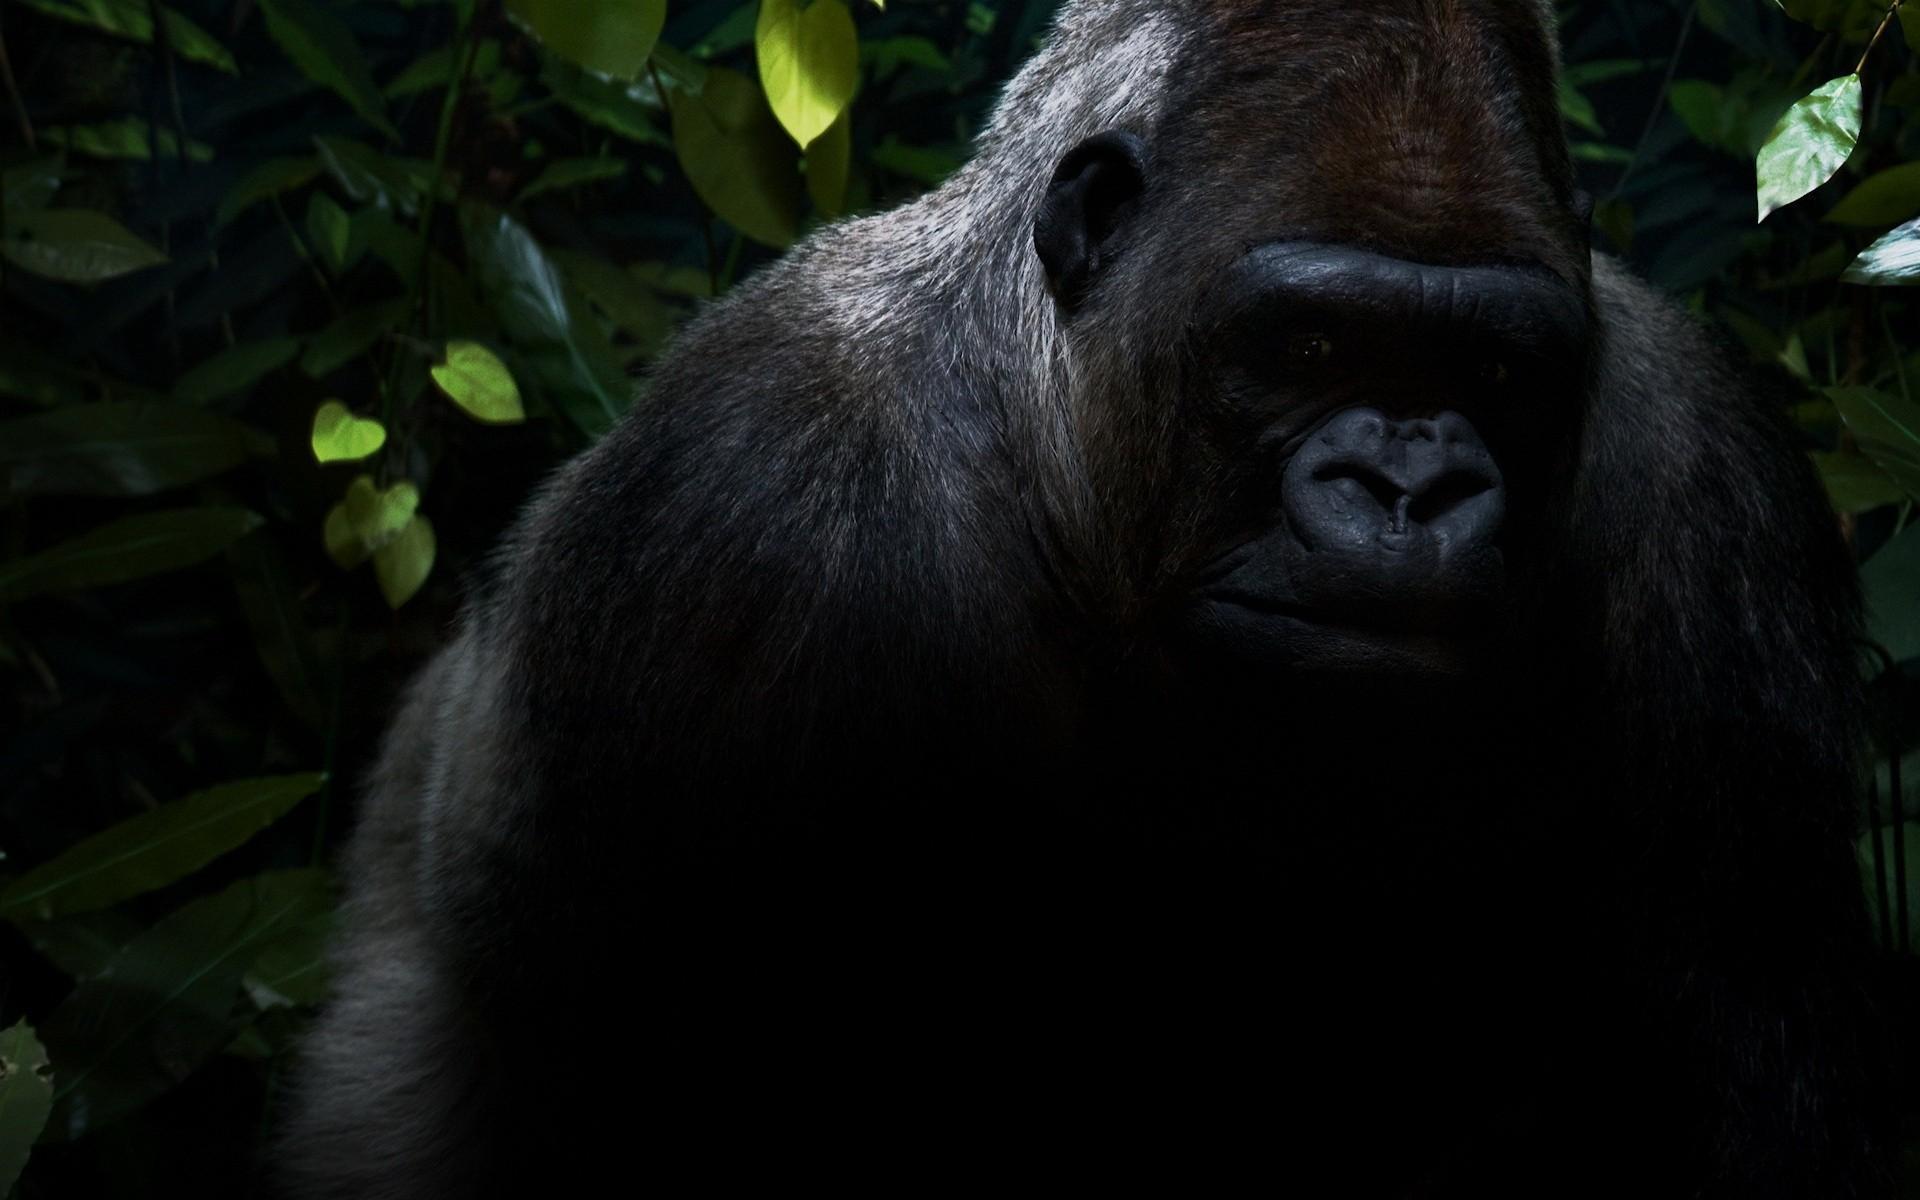 Gorilla wallpaper hd - photo#3